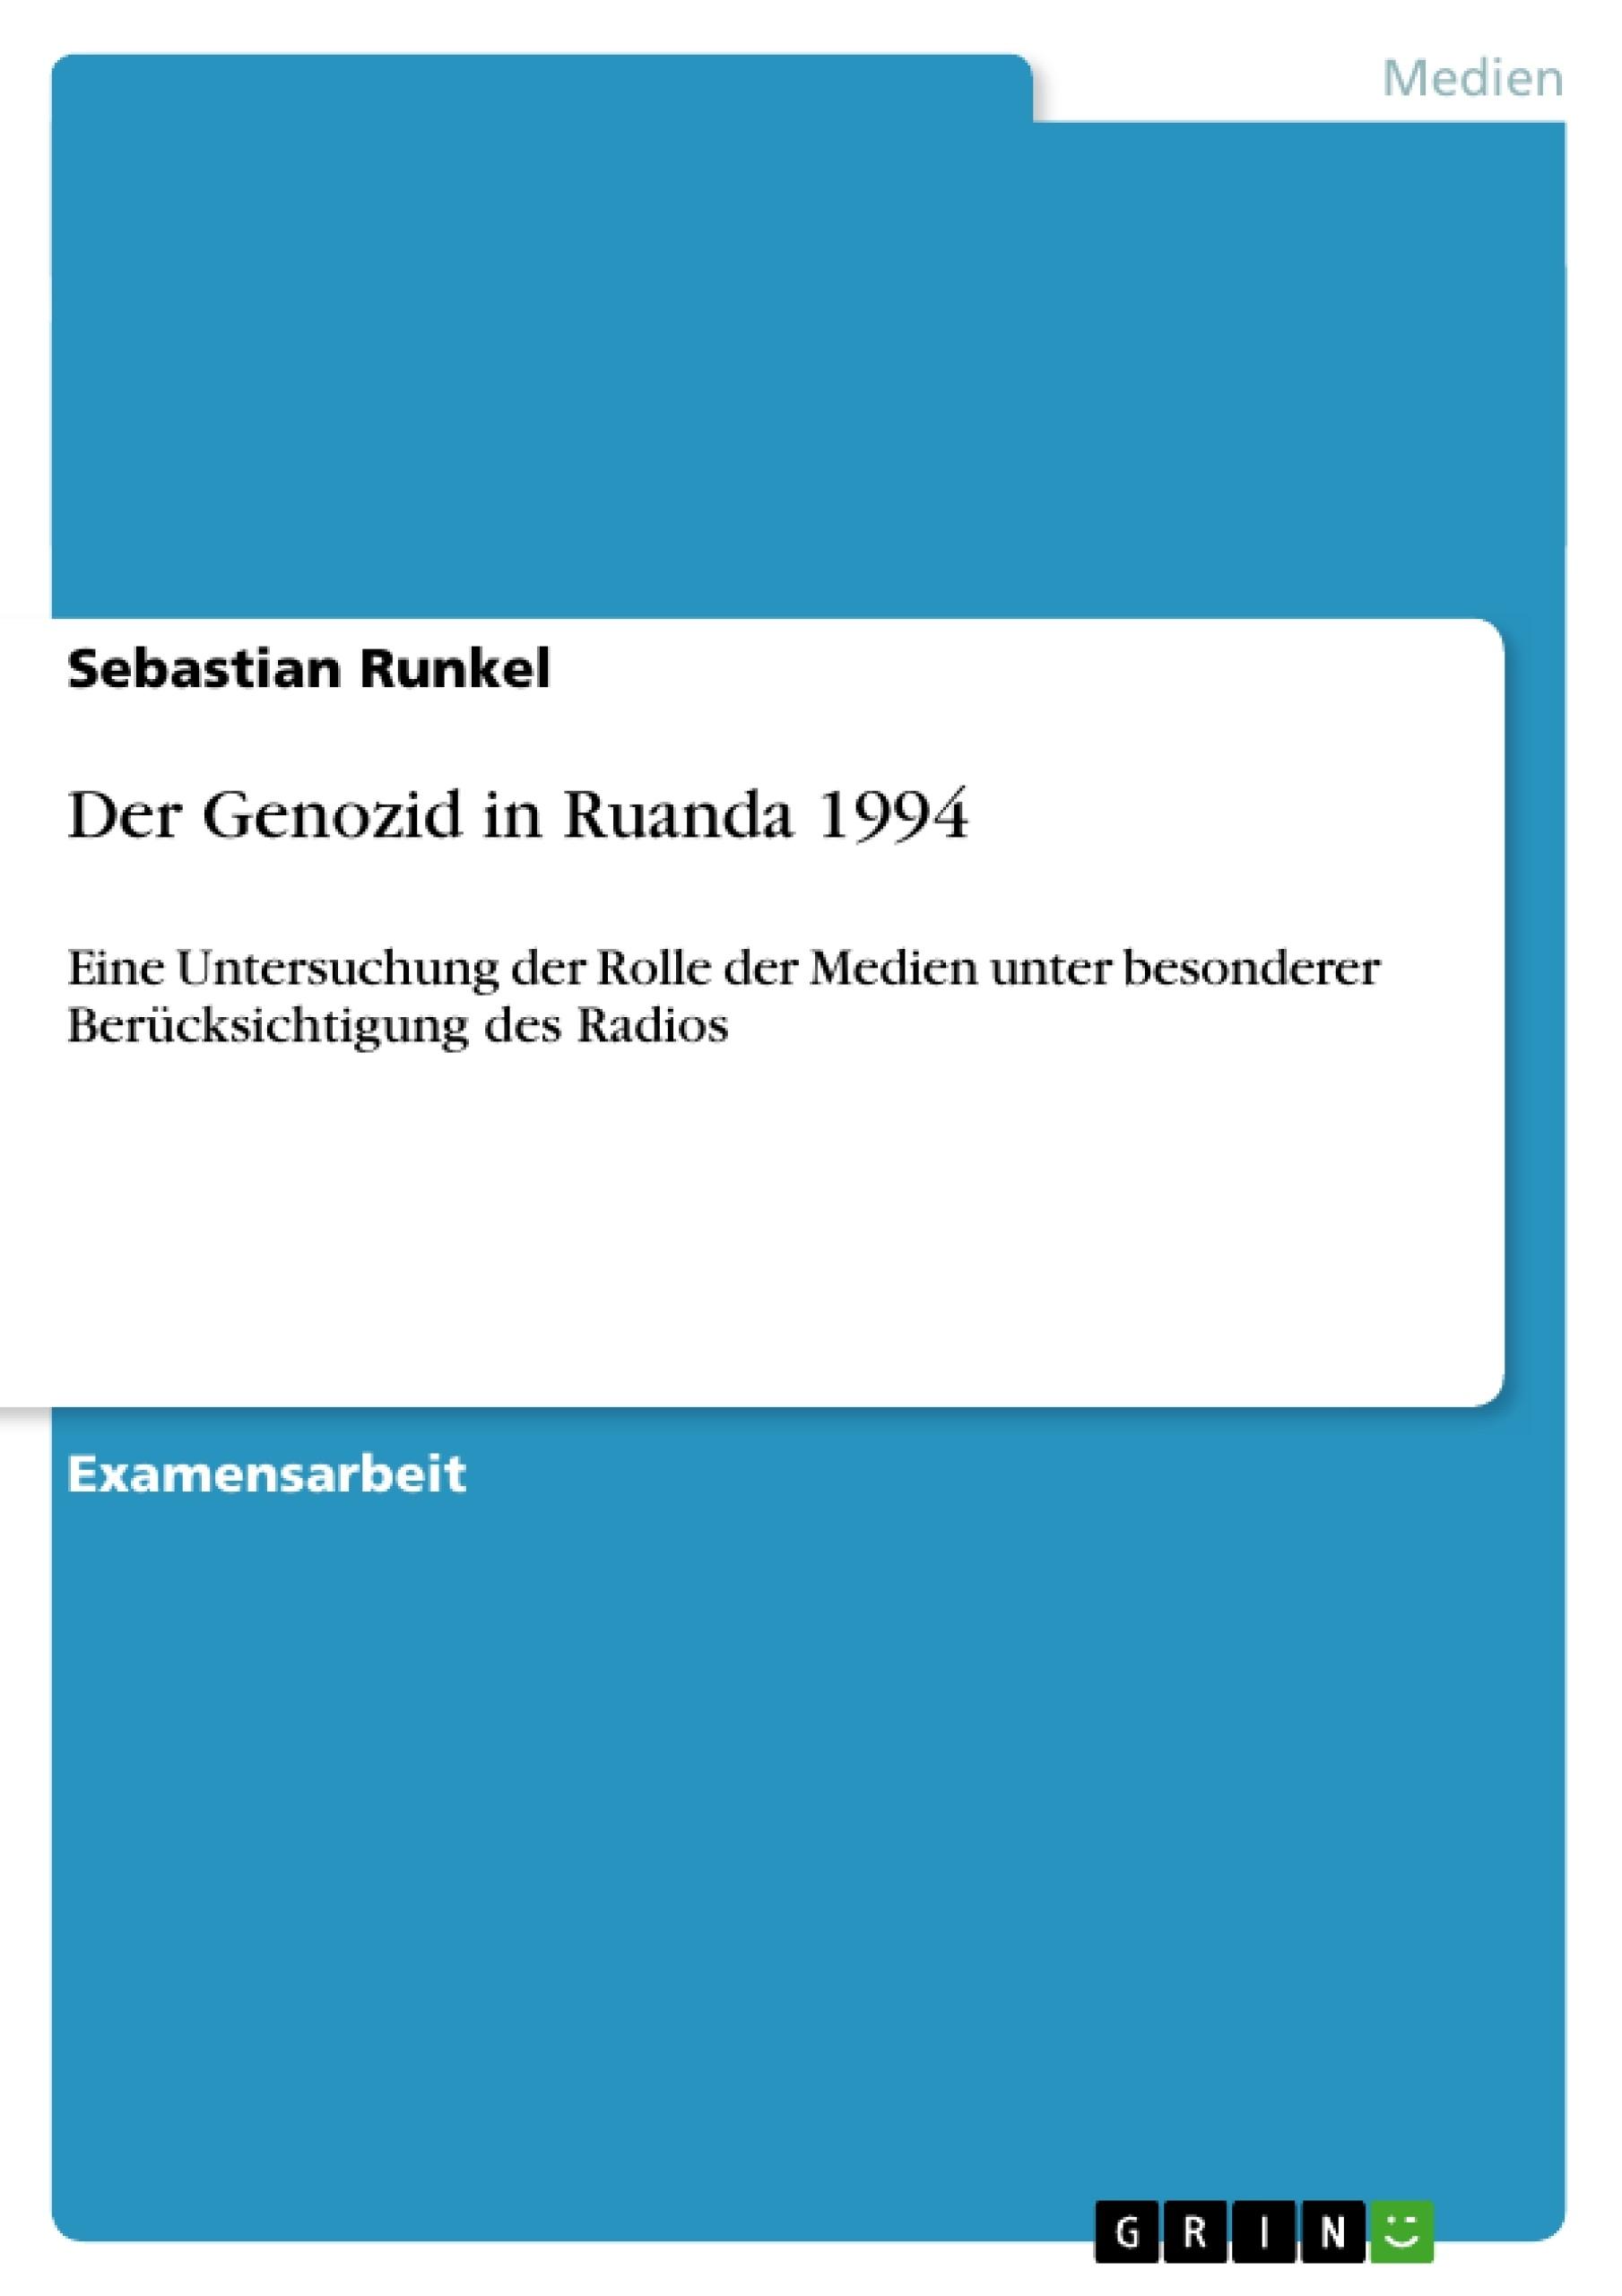 Titel: Der Genozid in Ruanda 1994